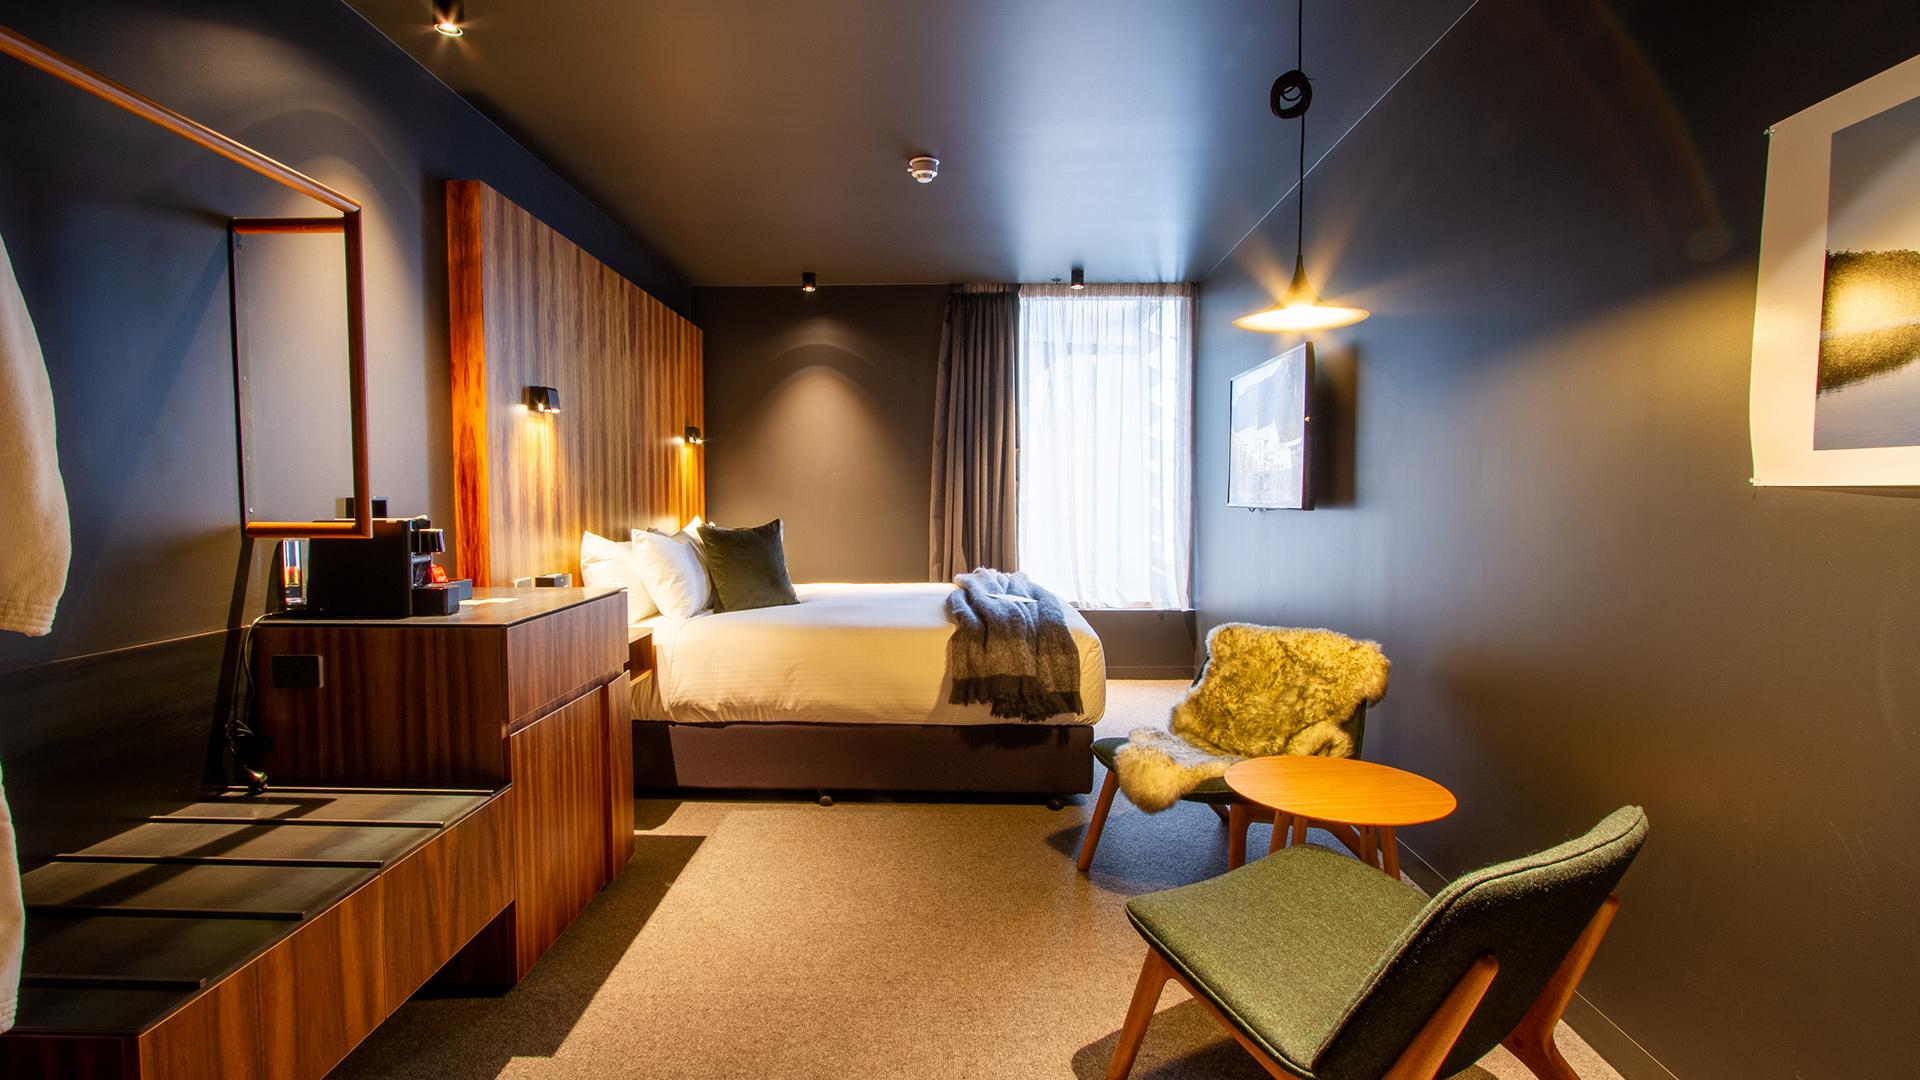 Pod Room - Feb 20 image 1 at Moss Hotel by Hobart City Council, Tasmania, Australia